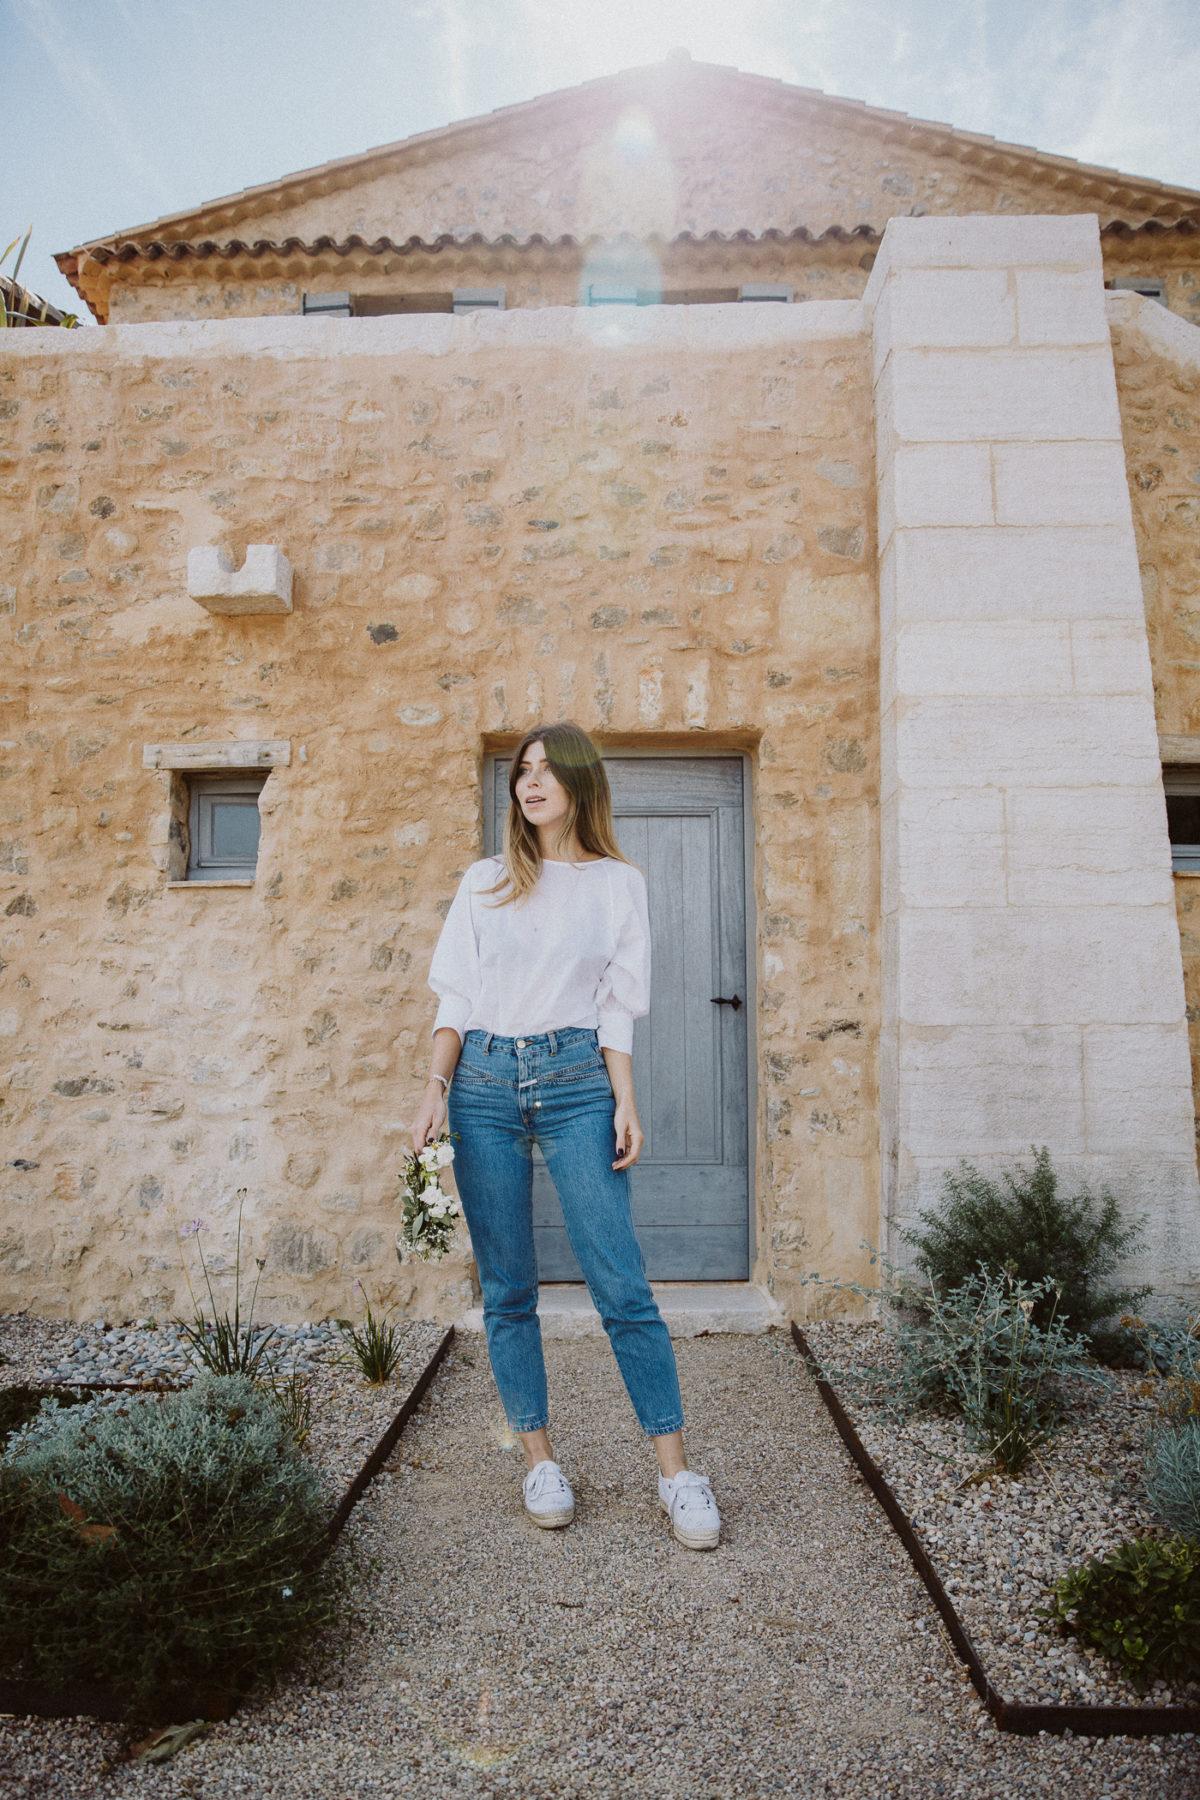 Closed pedal pusher jeans | Bikinis & Passports